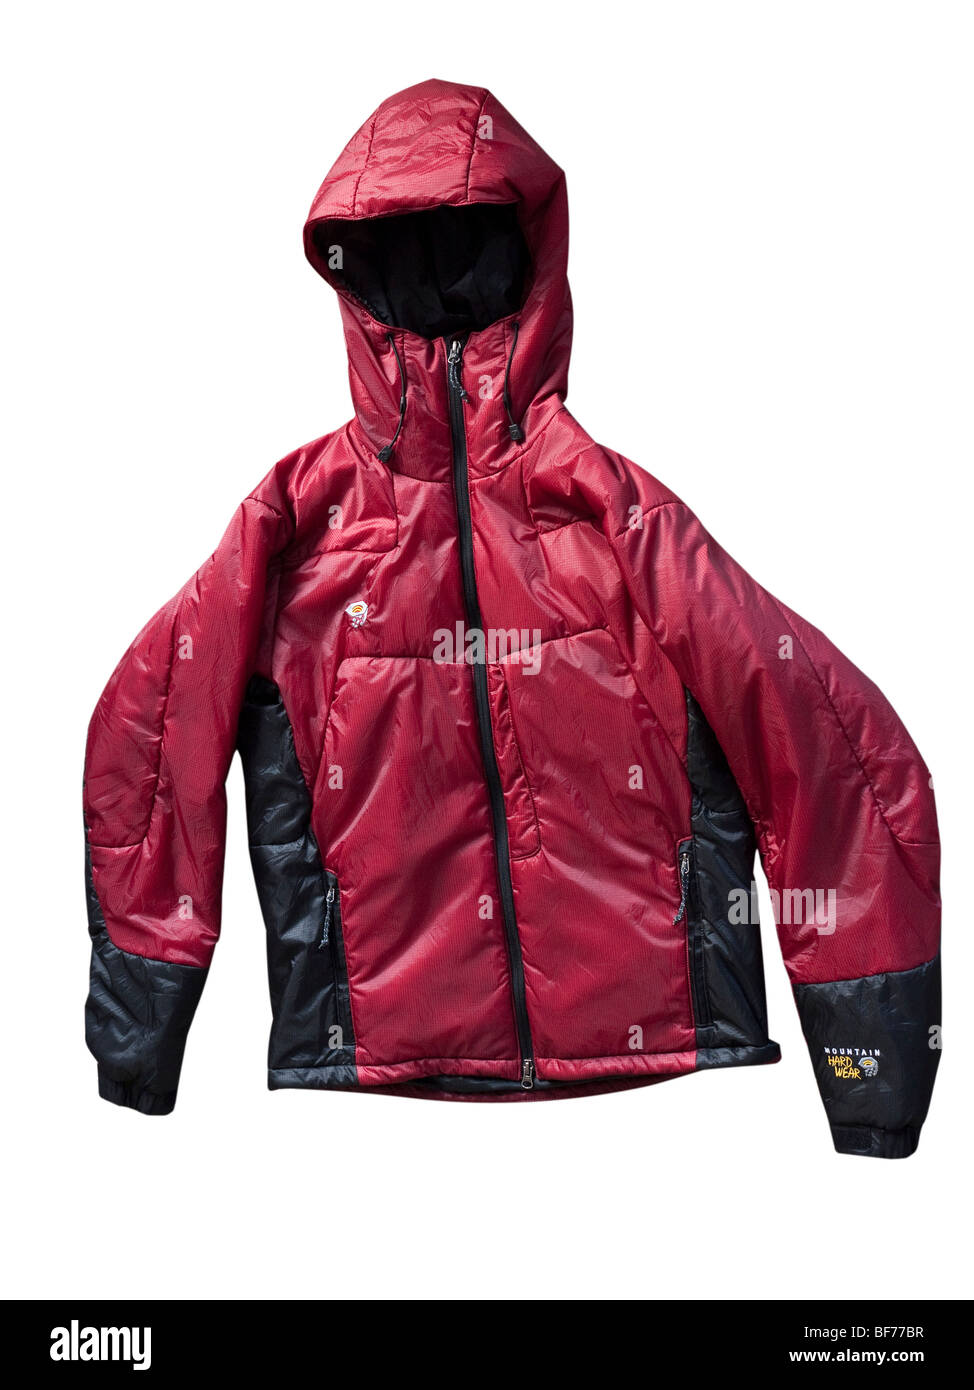 PrimaLoft gefüllt isolierte alpine Jacke Ausschnitt Stockbild